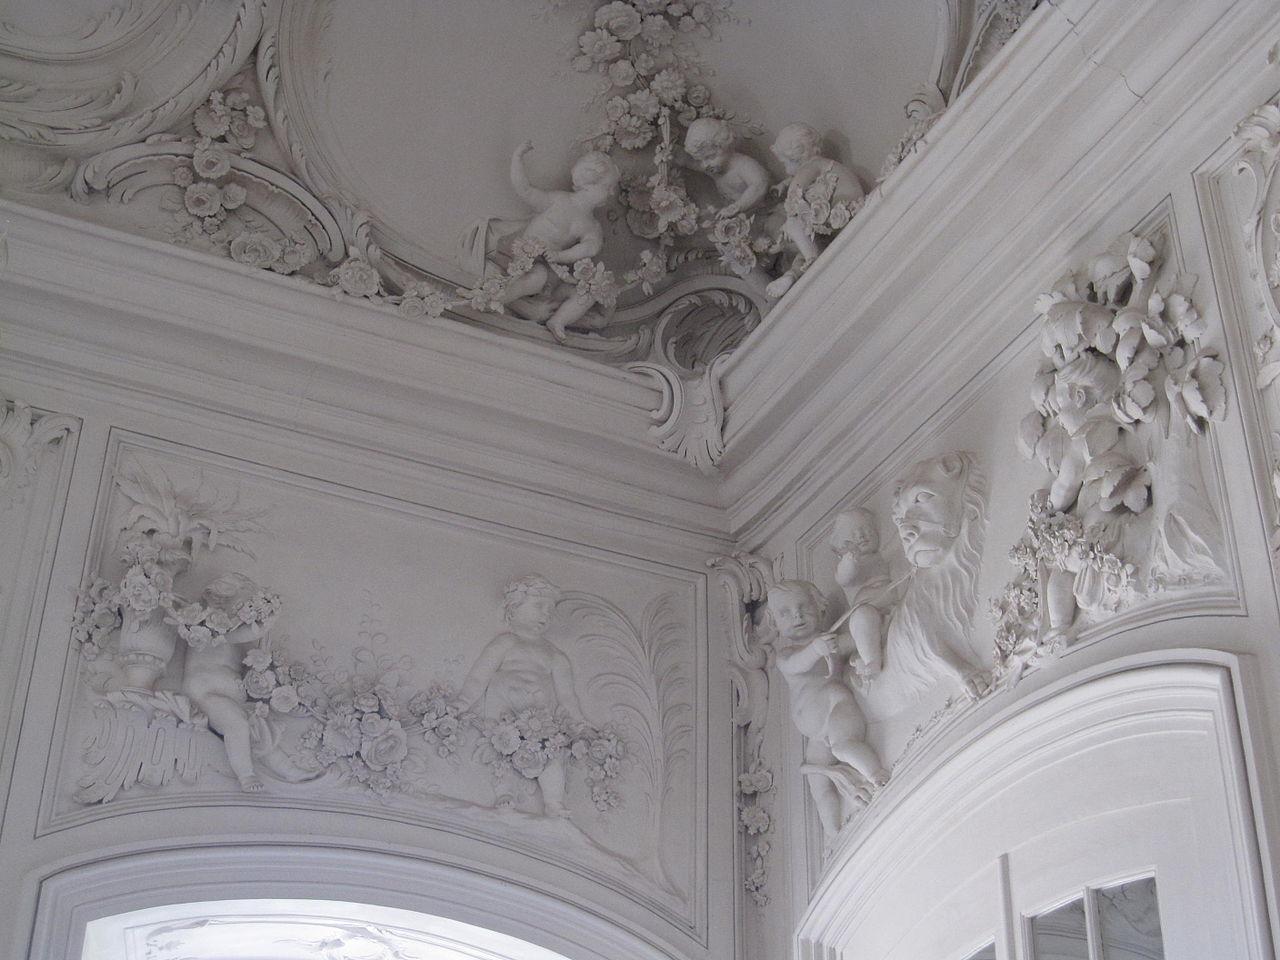 File Rundale Palace Interior Stucco Decorations Jpg